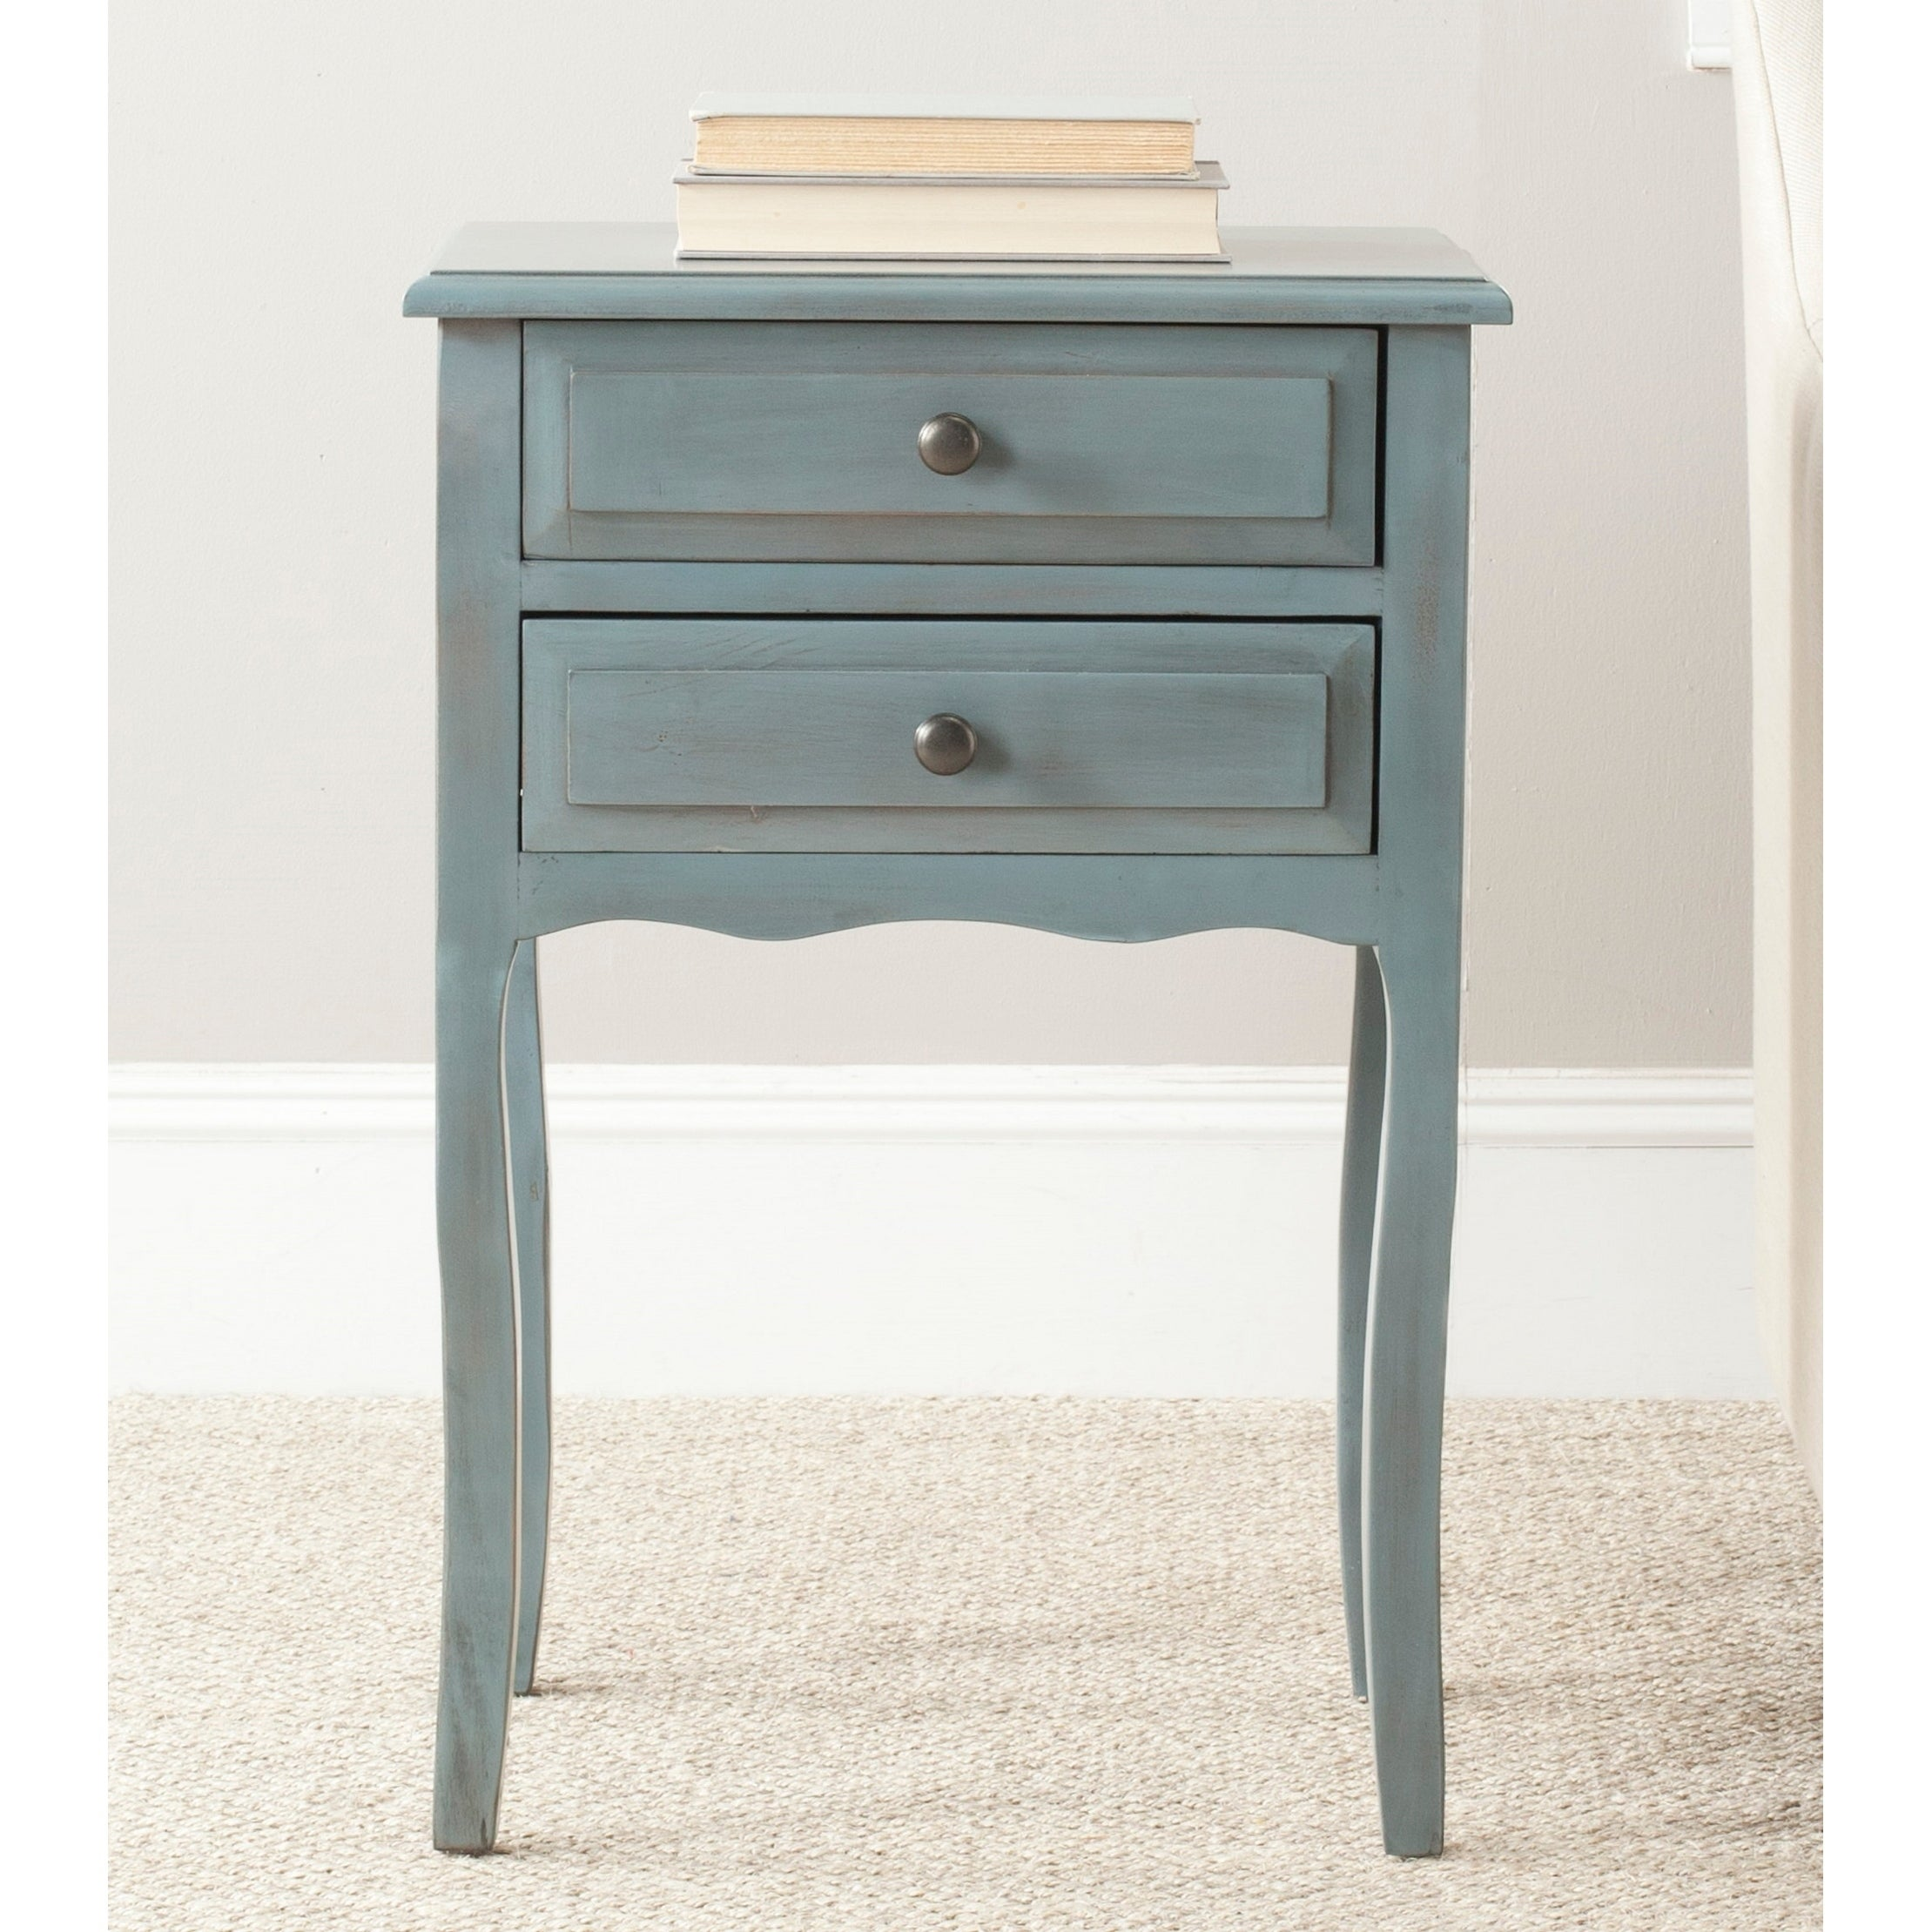 - Shop Safavieh Lori Blue/ Grey Accent Table - 18.1